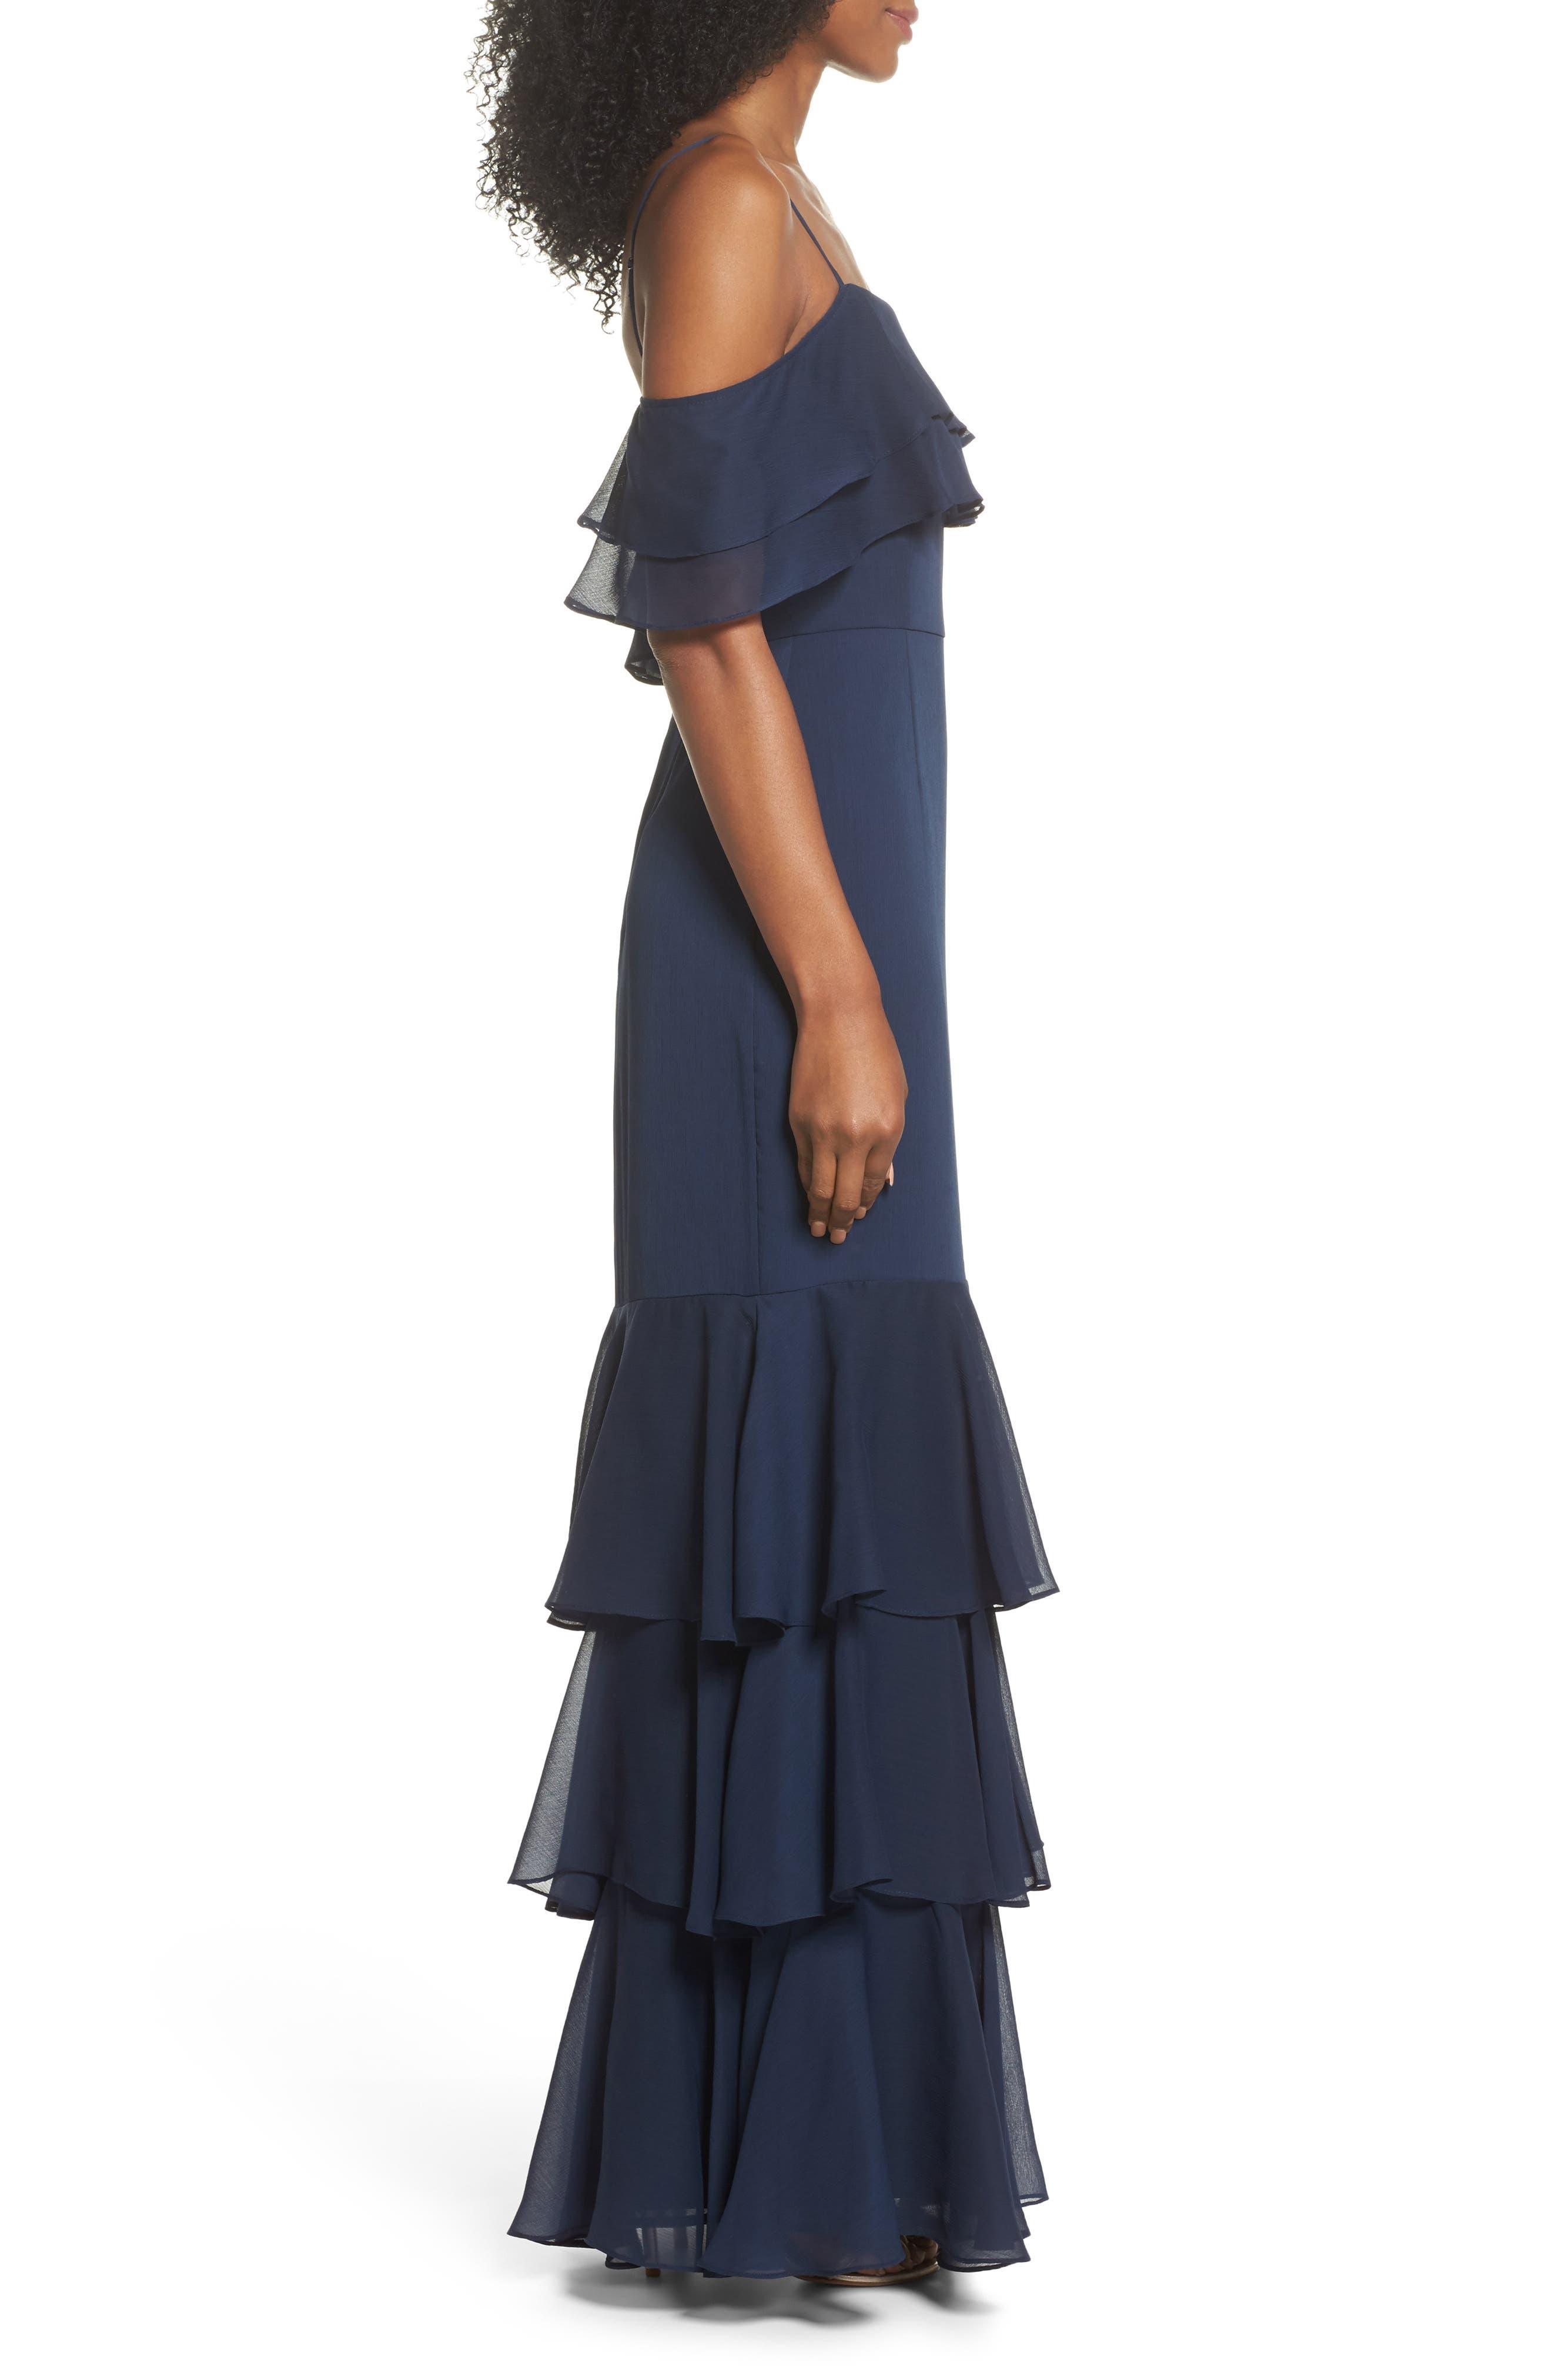 Lauren Cold Shoulder Tiered Gown,                             Alternate thumbnail 3, color,                             Navy